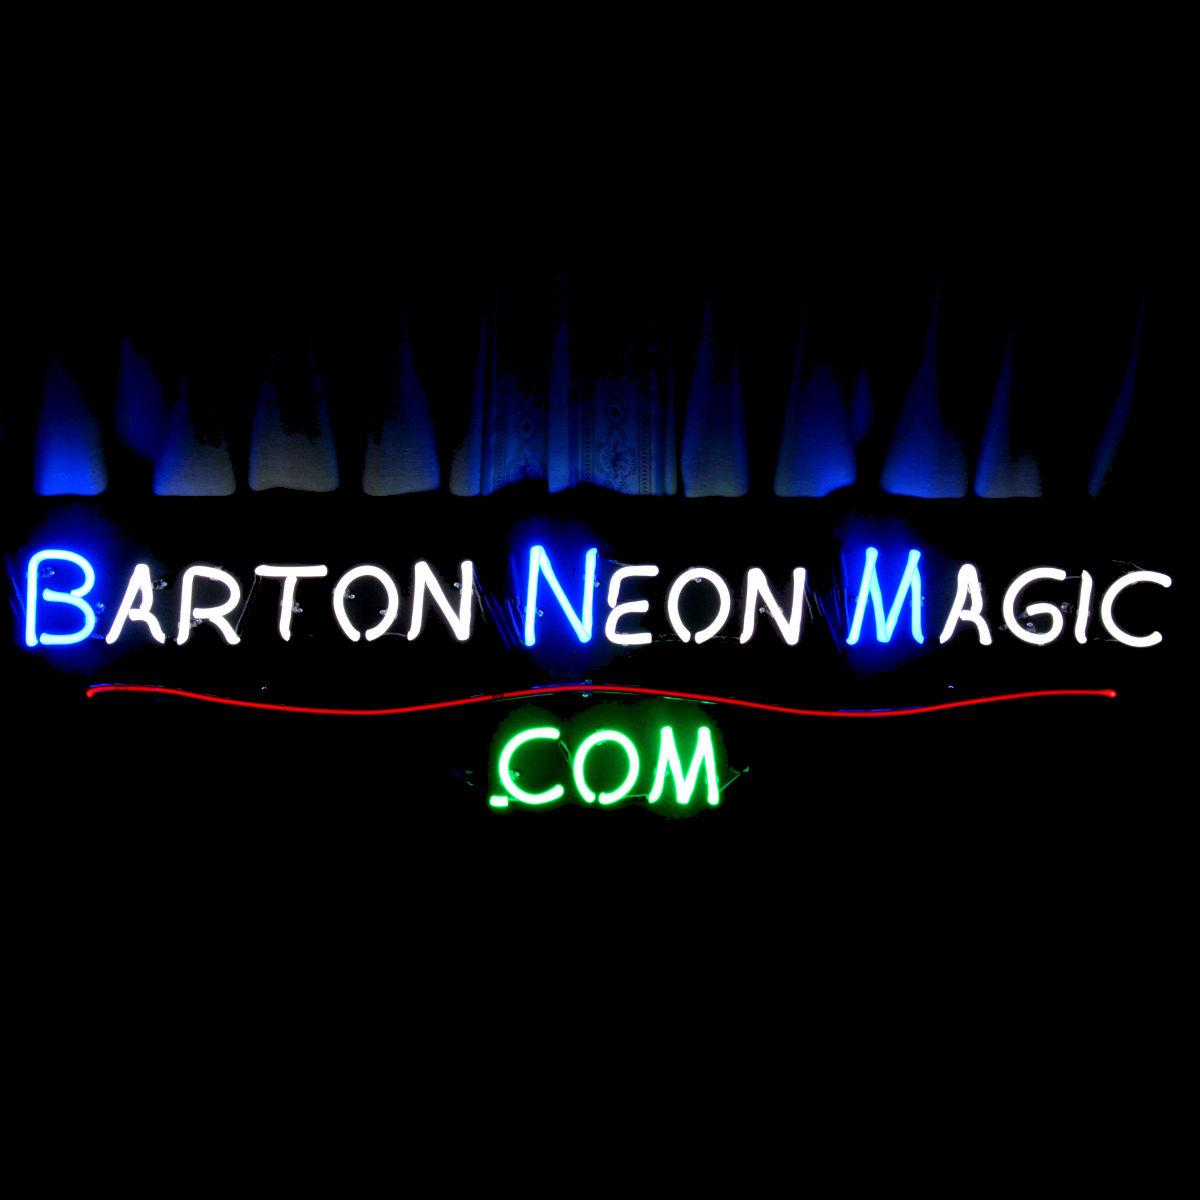 STUDEBAKER NEON SIGNS BY JOHN BARTON - BartonNeonMagic.com